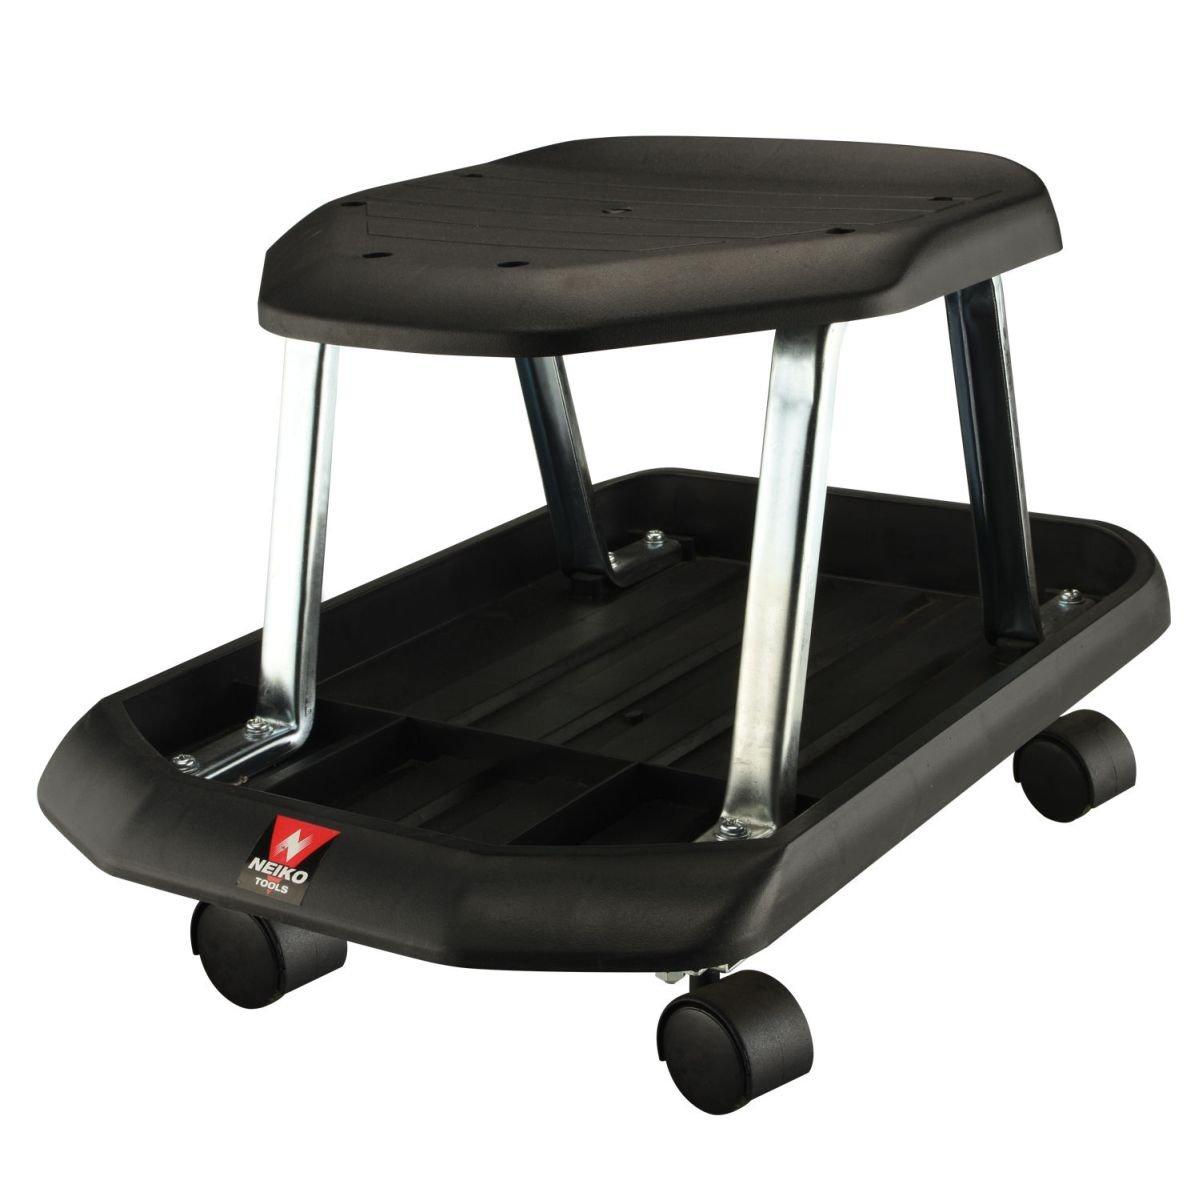 Te echo de menos Mechanics Rolling Shop Seat Creeper Roller Garden Stool w/ Tool Storage Tray